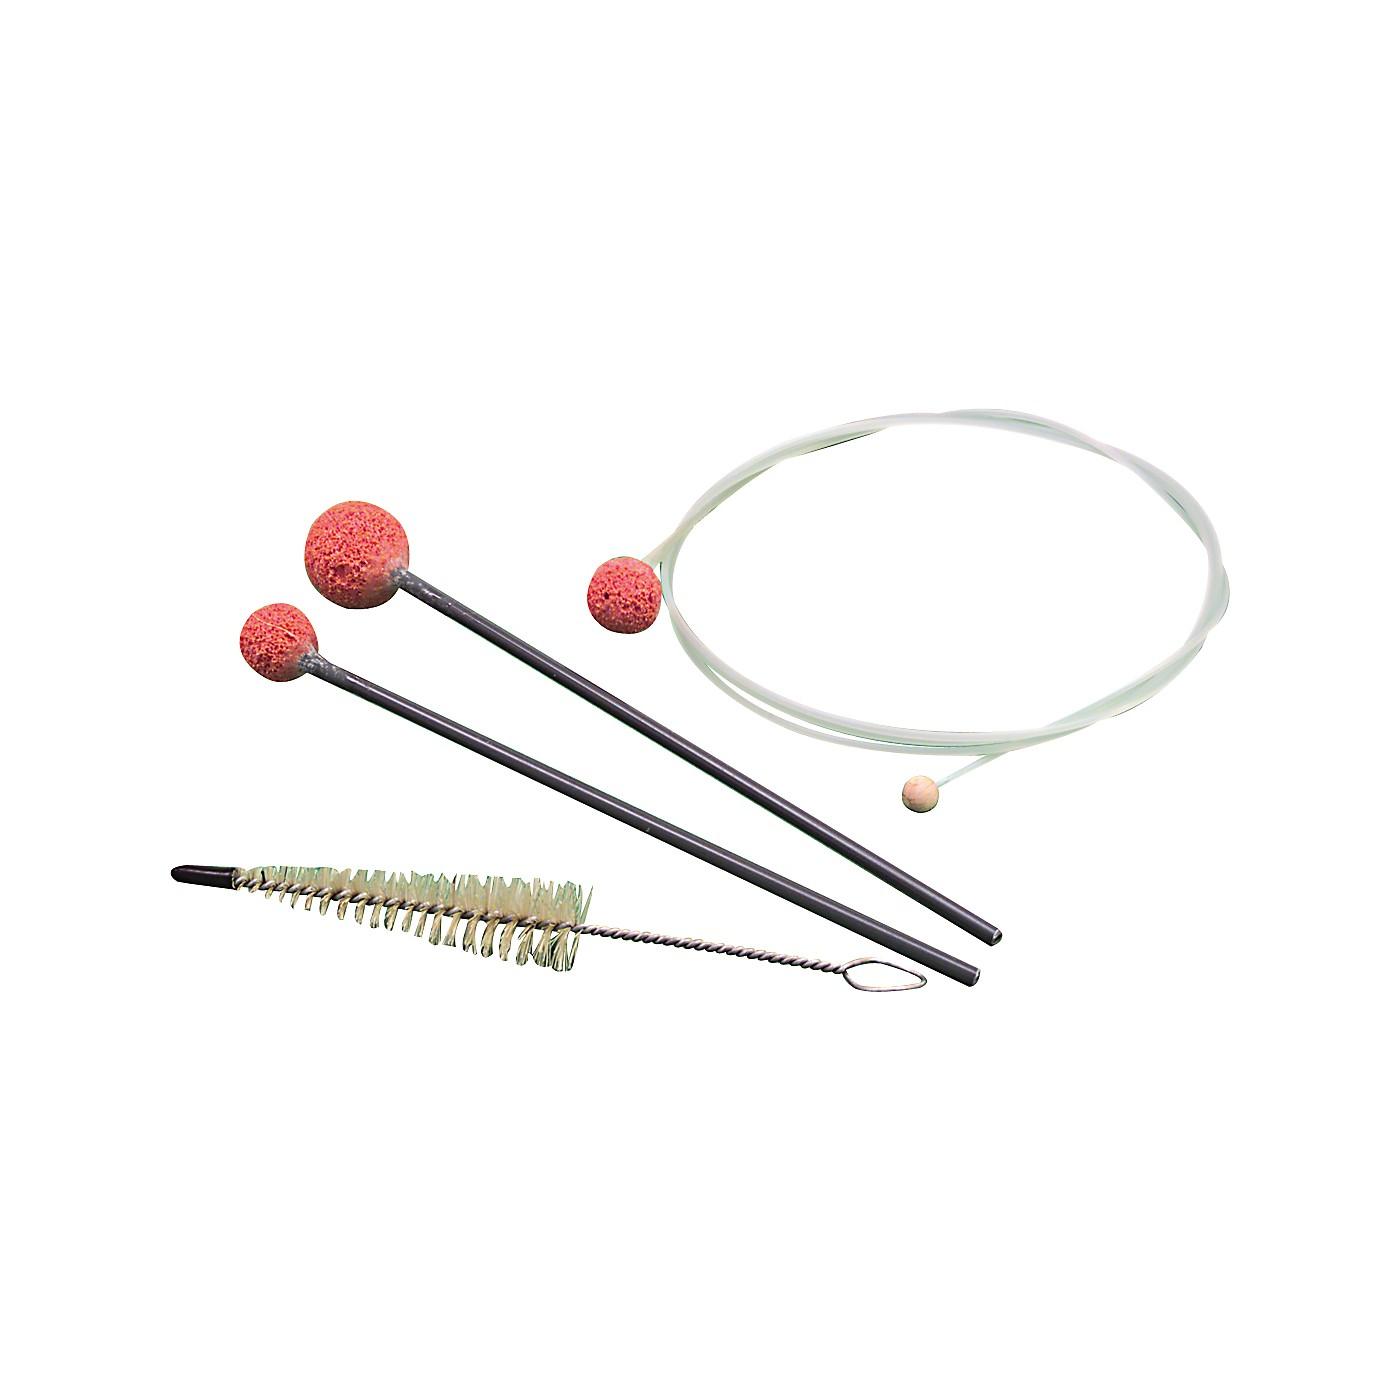 Reka Trumpet, Cornet, Flugelhorn Cleaning Kit thumbnail